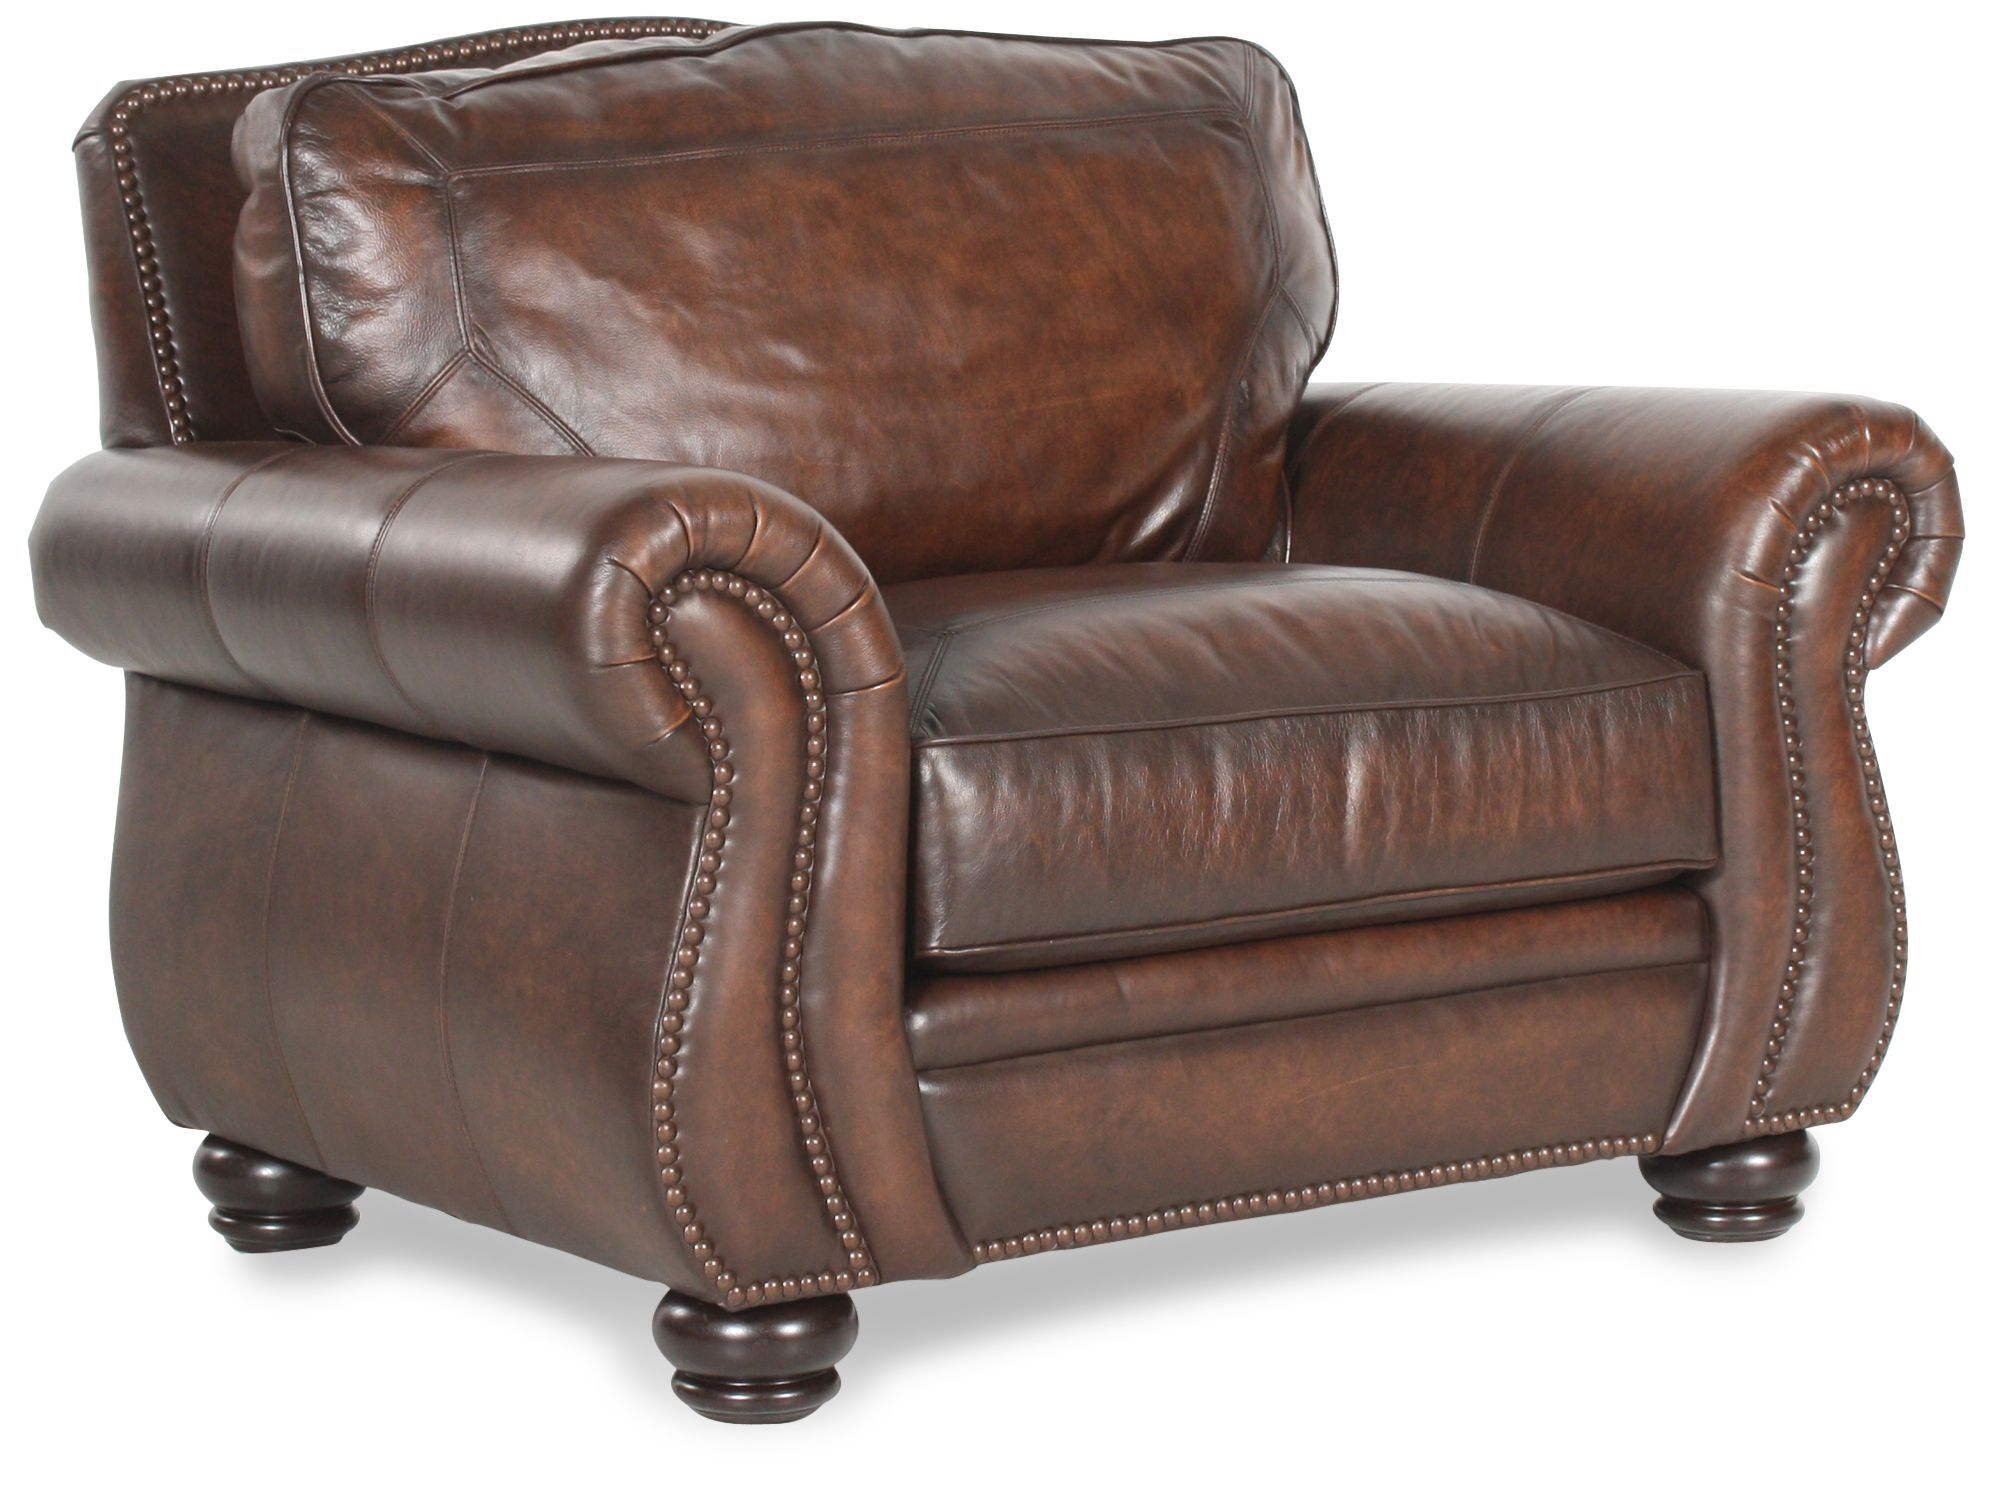 Bernhardt Breckenridge Leather Chair  Mathis Brothers